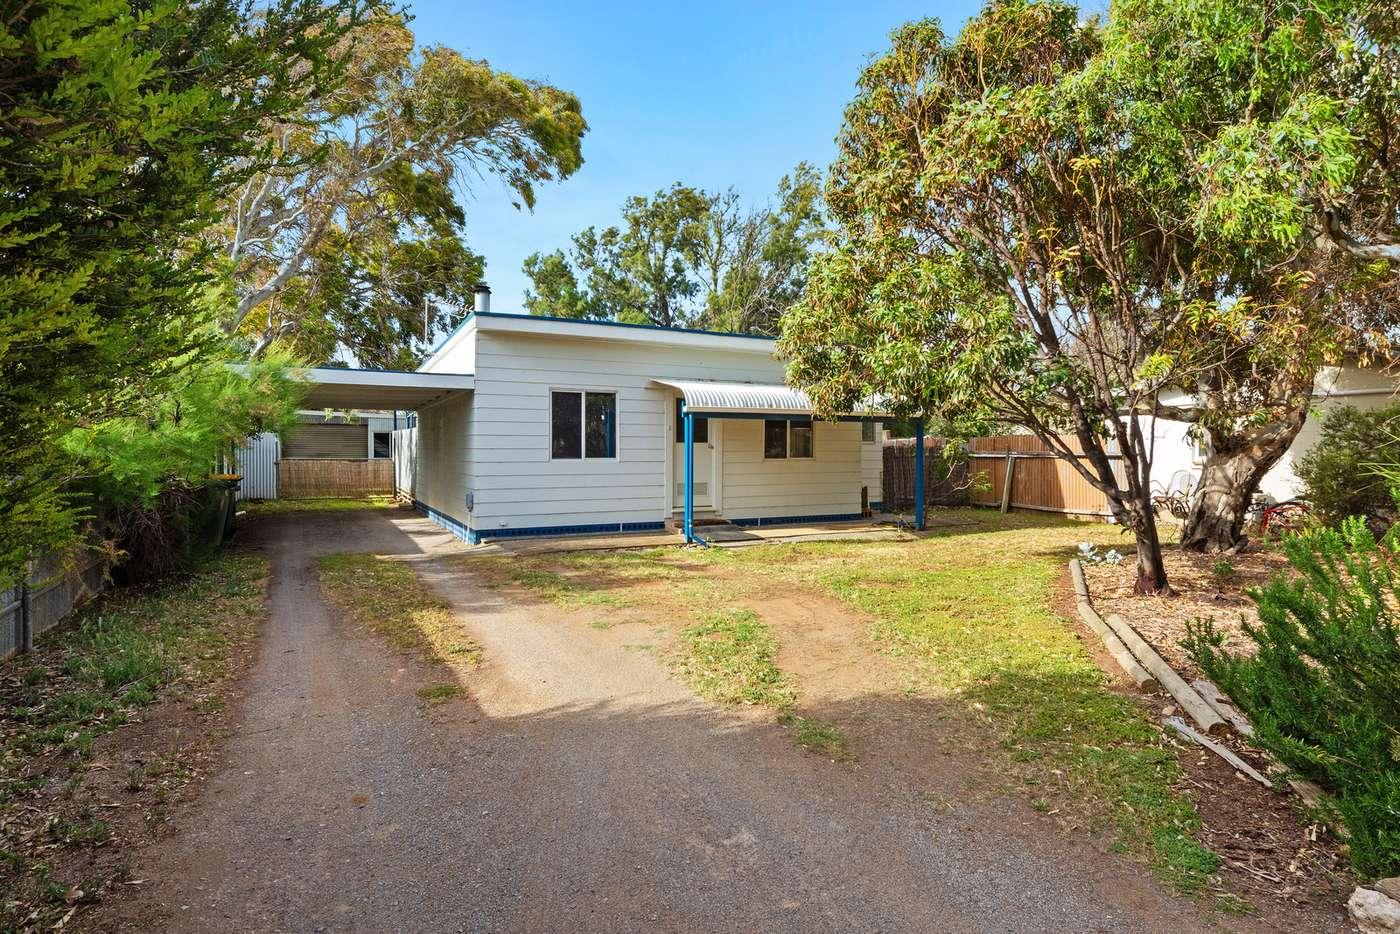 Main view of Homely house listing, 17 Gordon Street, Aldinga Beach, SA 5173